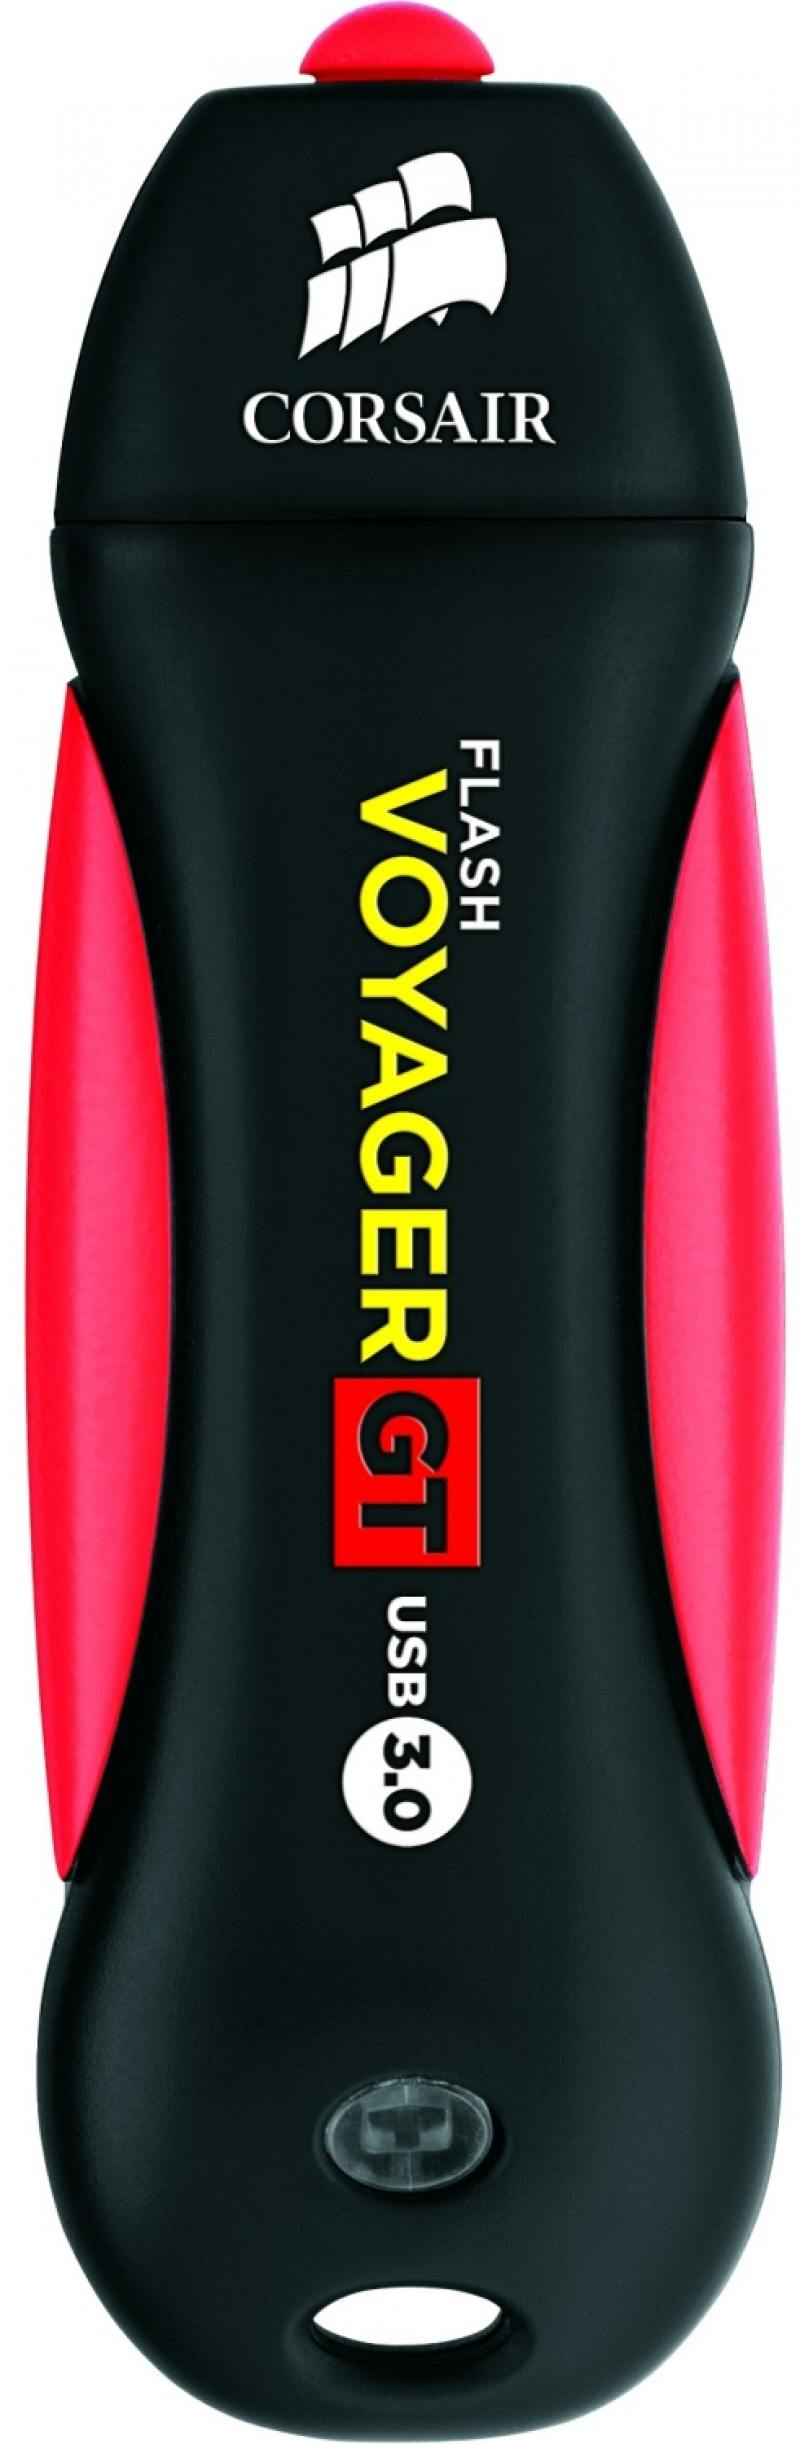 Флешка USB 128Gb Corsair Voyager GT USB3.0 CMFVYGT3B-128GB черно-красный usb накопитель corsair 128gb voyager go cmfvg 128gb черный cmfvg 128gb